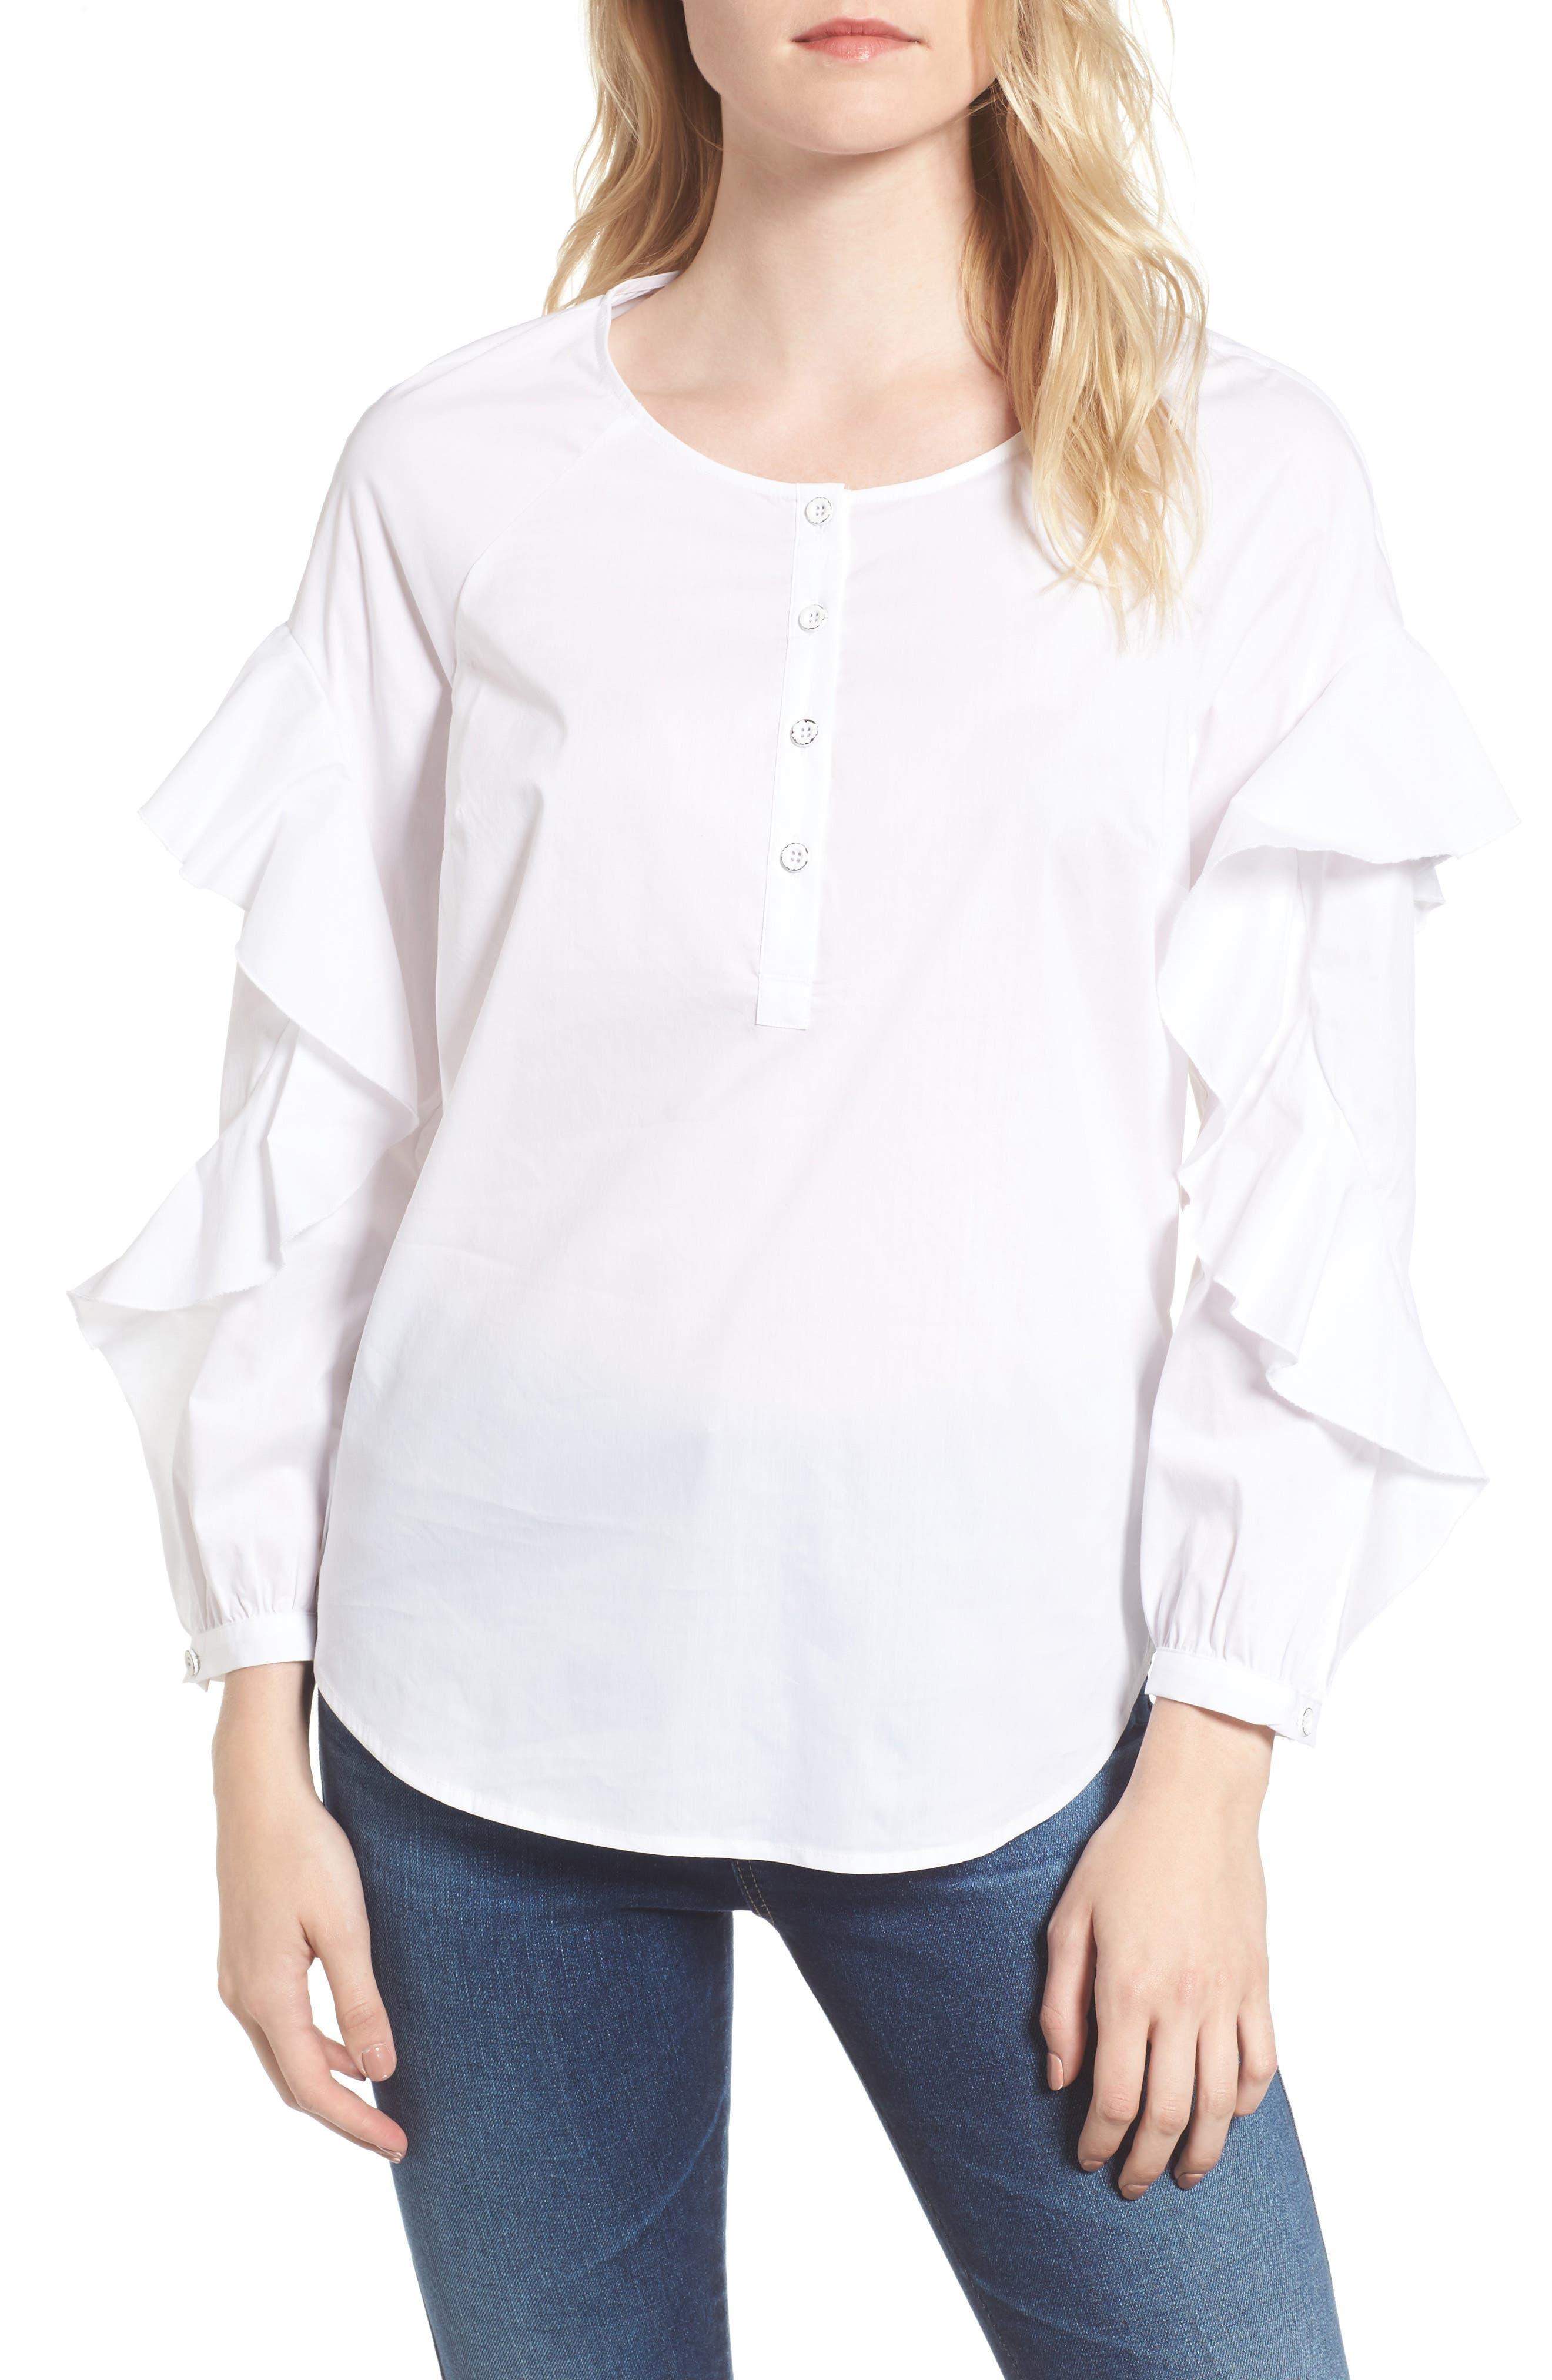 Splendid Ruffle Sleeve Shirt